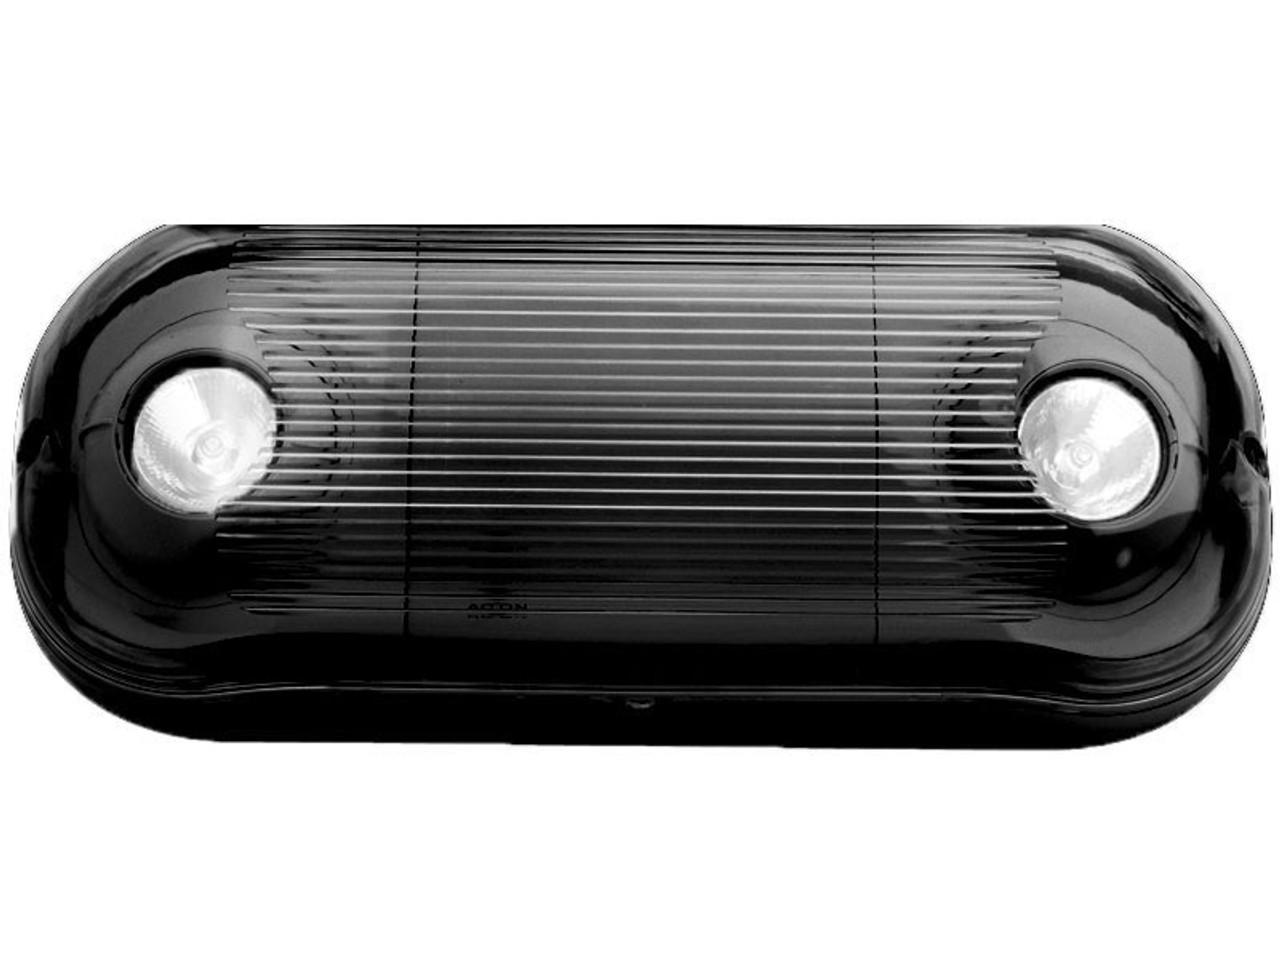 Weather Proof Emergency Light Halogen MR-16 Heads Black